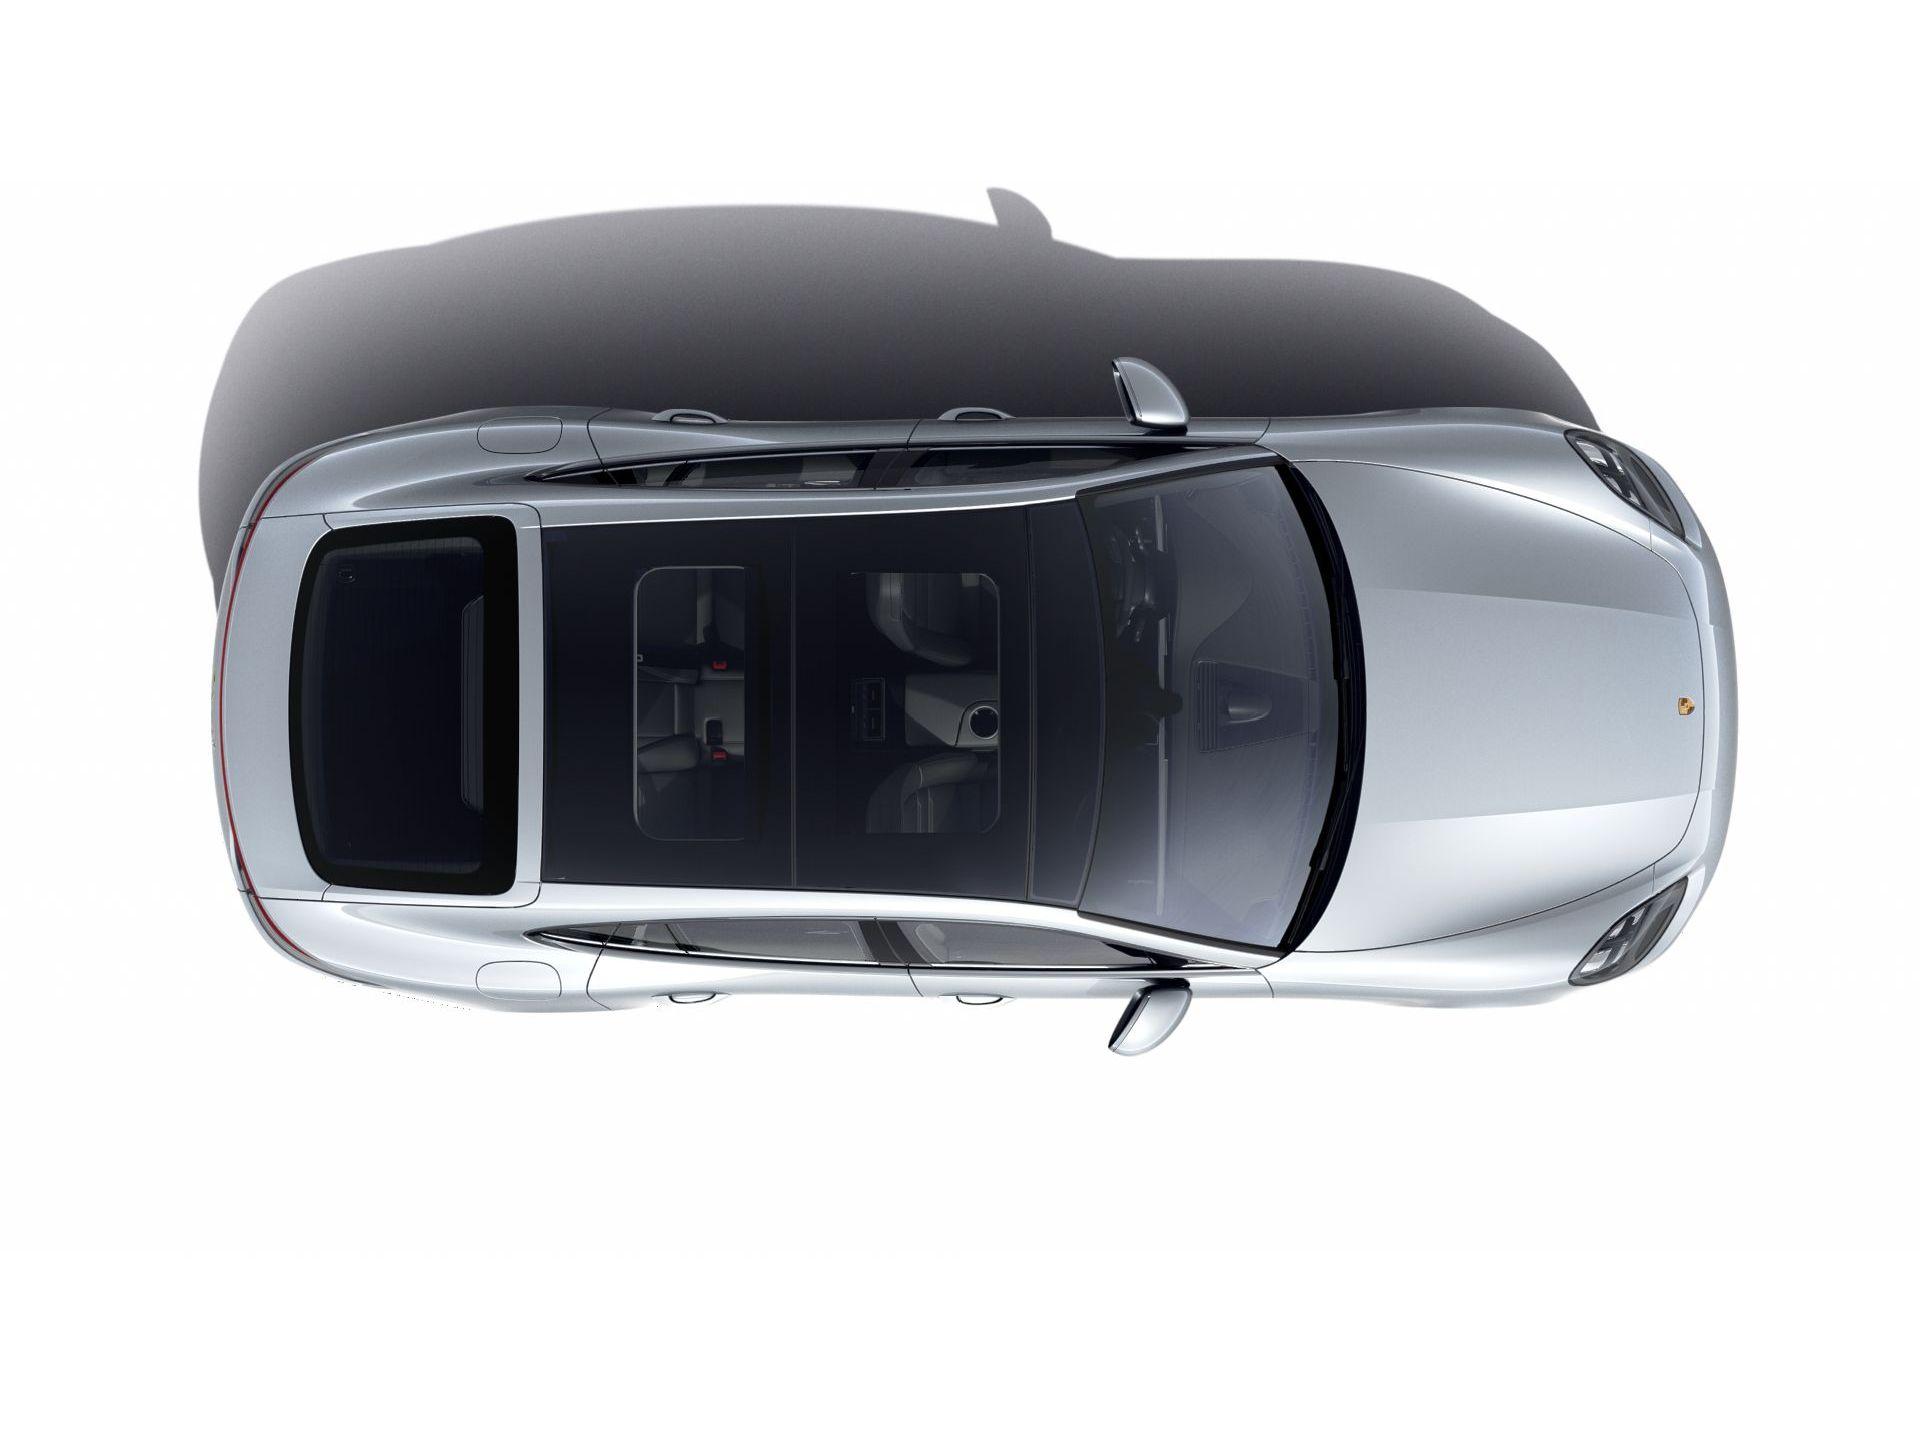 2022 Porsche Panamera 4 E-Hybrid – 5